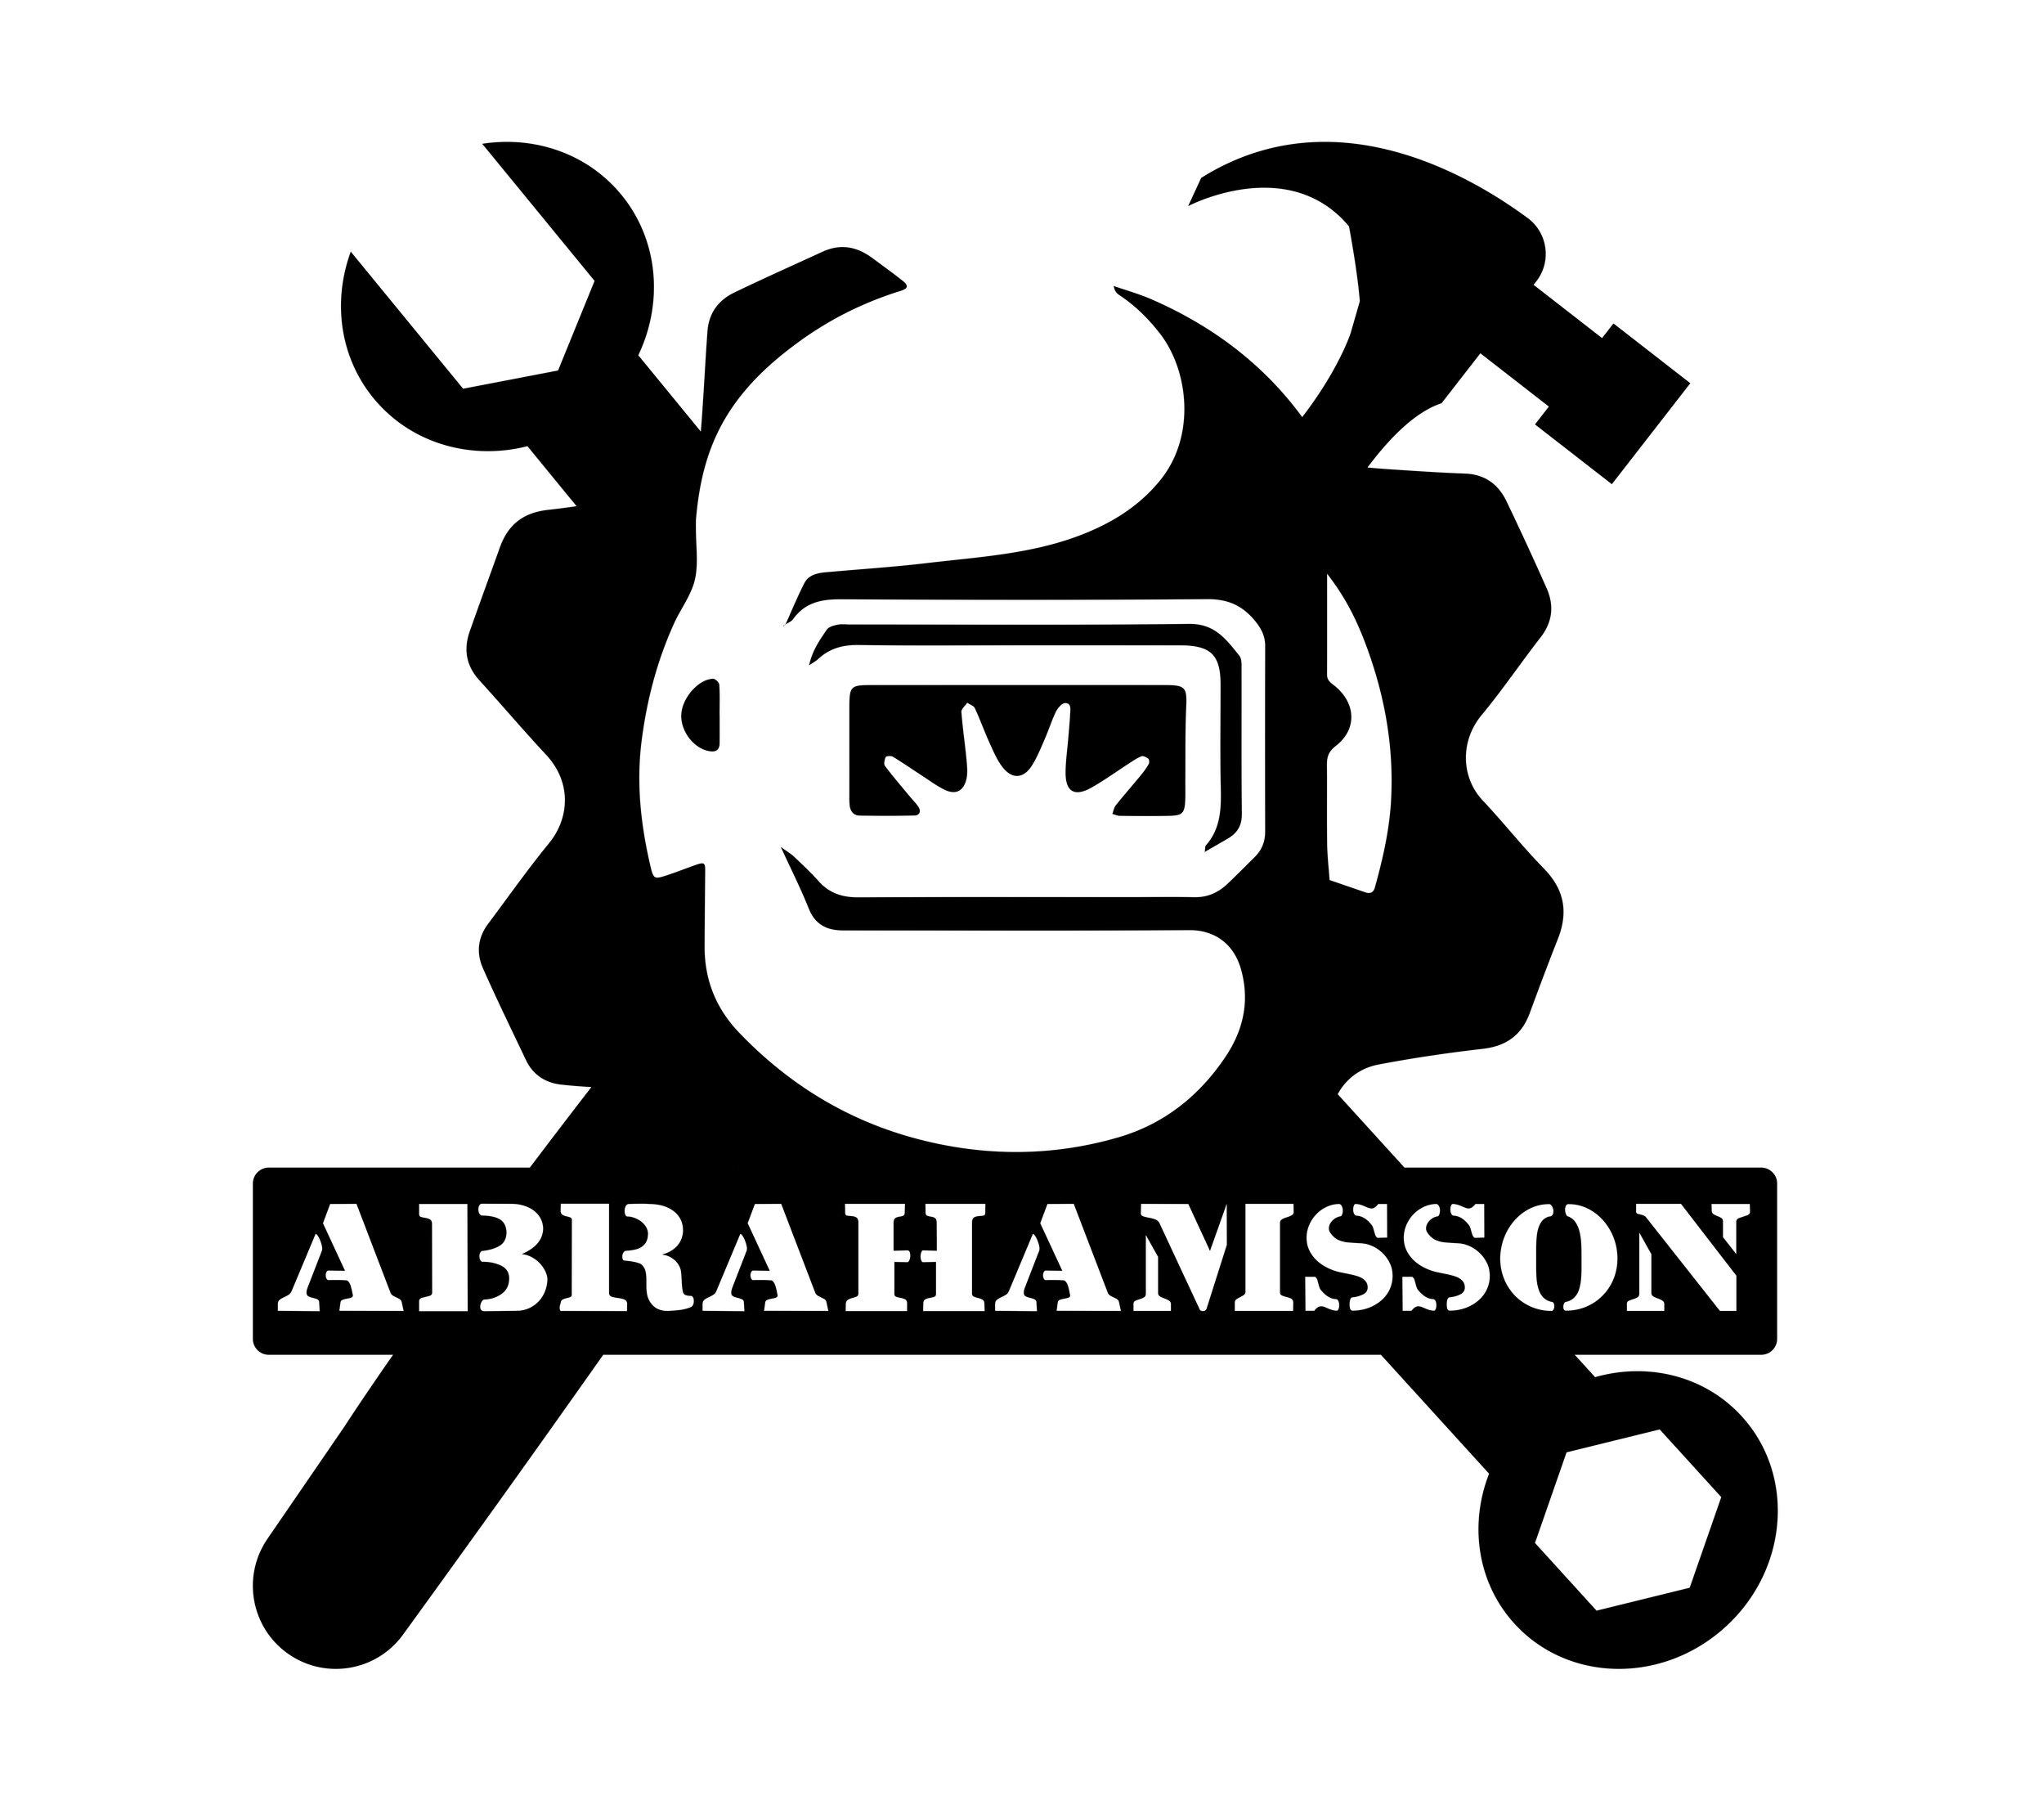 Abrahamsson_logga.jpg